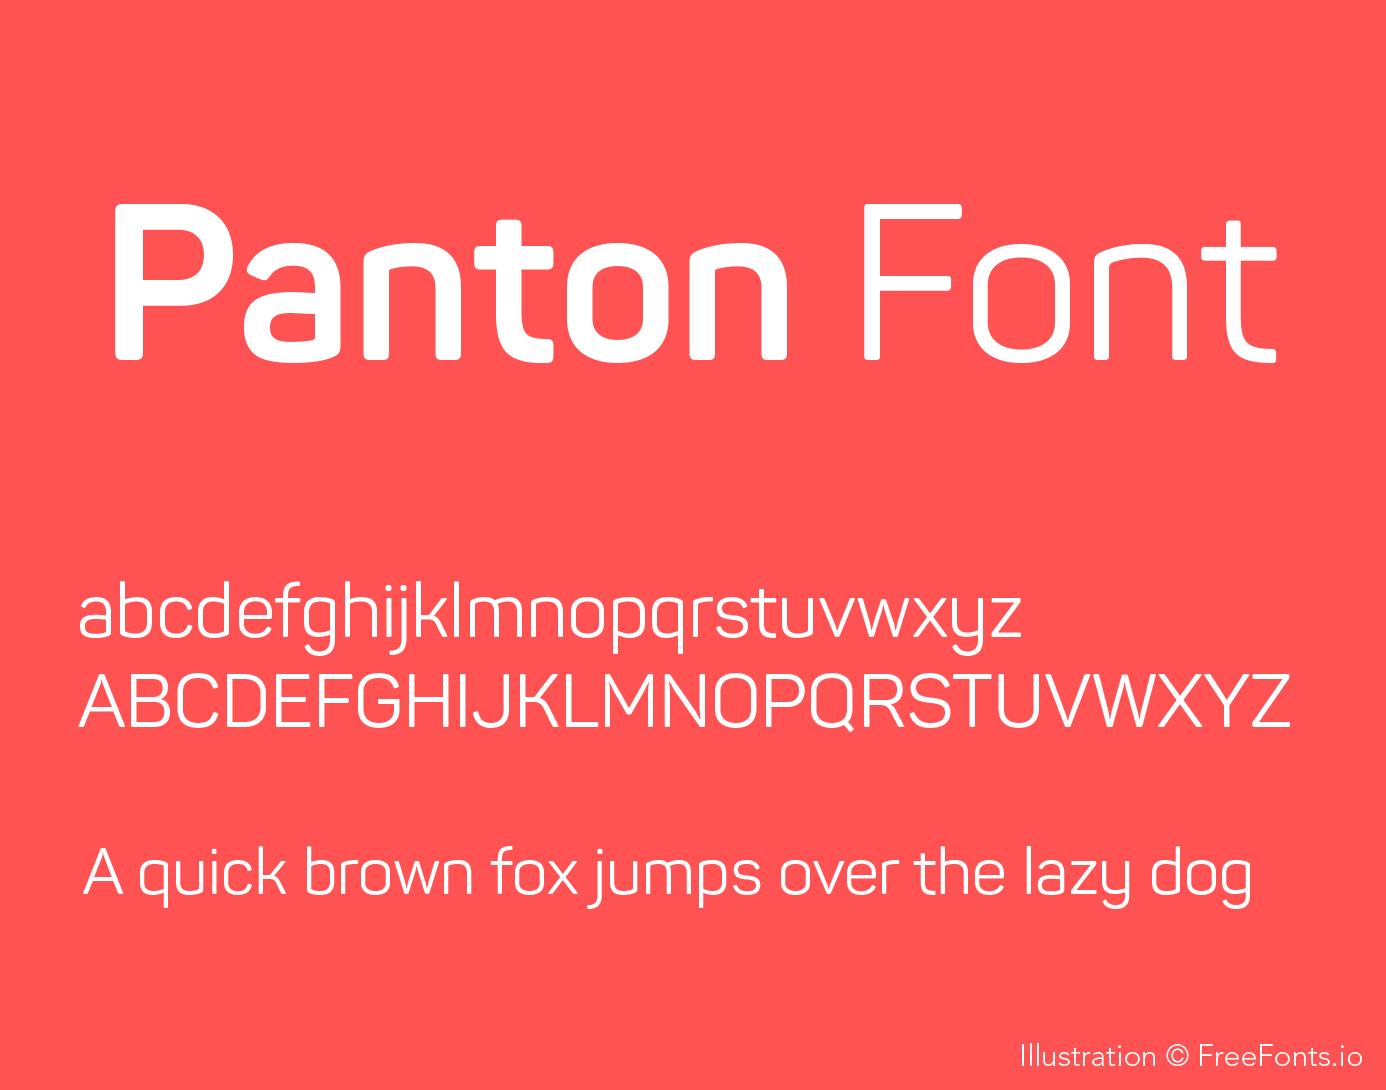 panton-font-poster